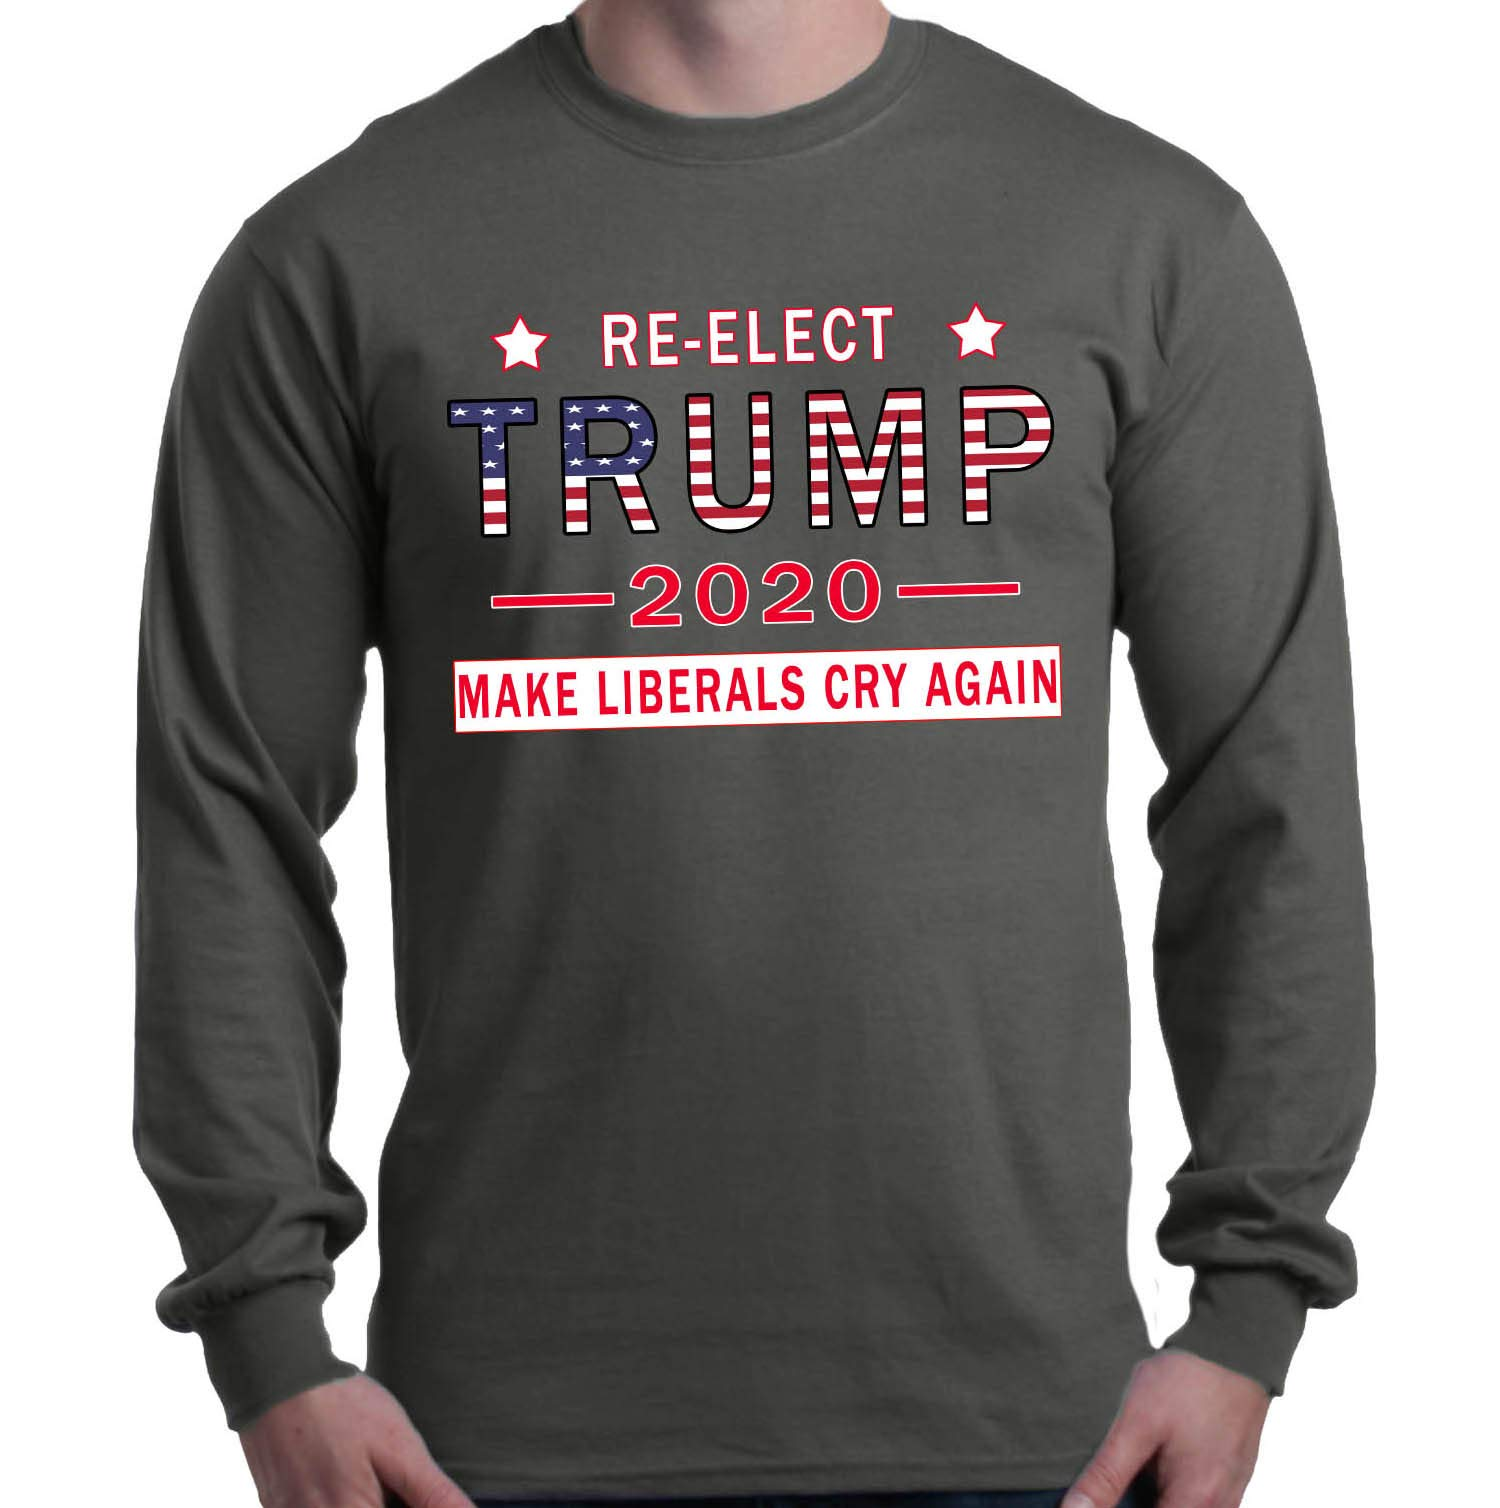 Reelect Trump 2020 Make Liberals Cry Again Shirt Political Shirts